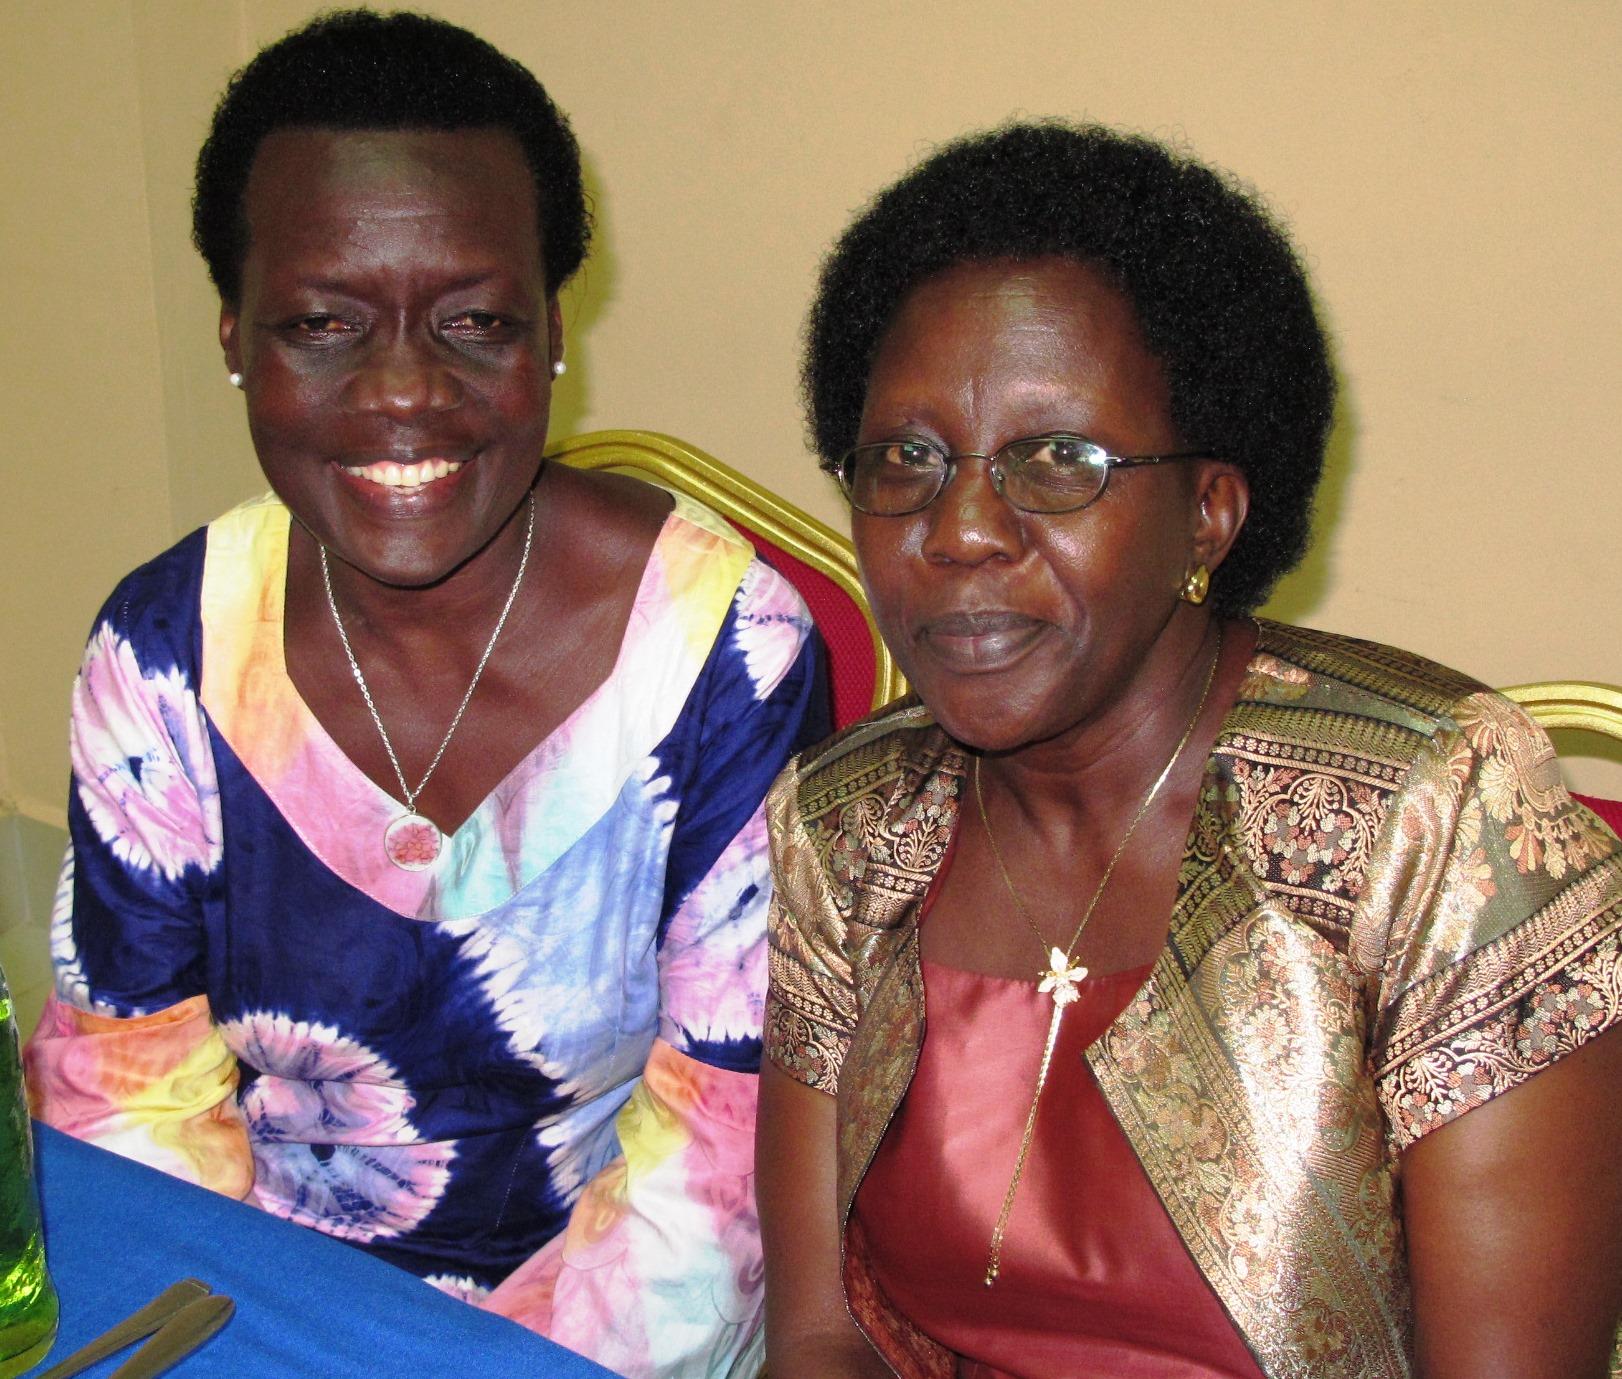 Joyce and Elizabeth, Life Ministry staff leaders